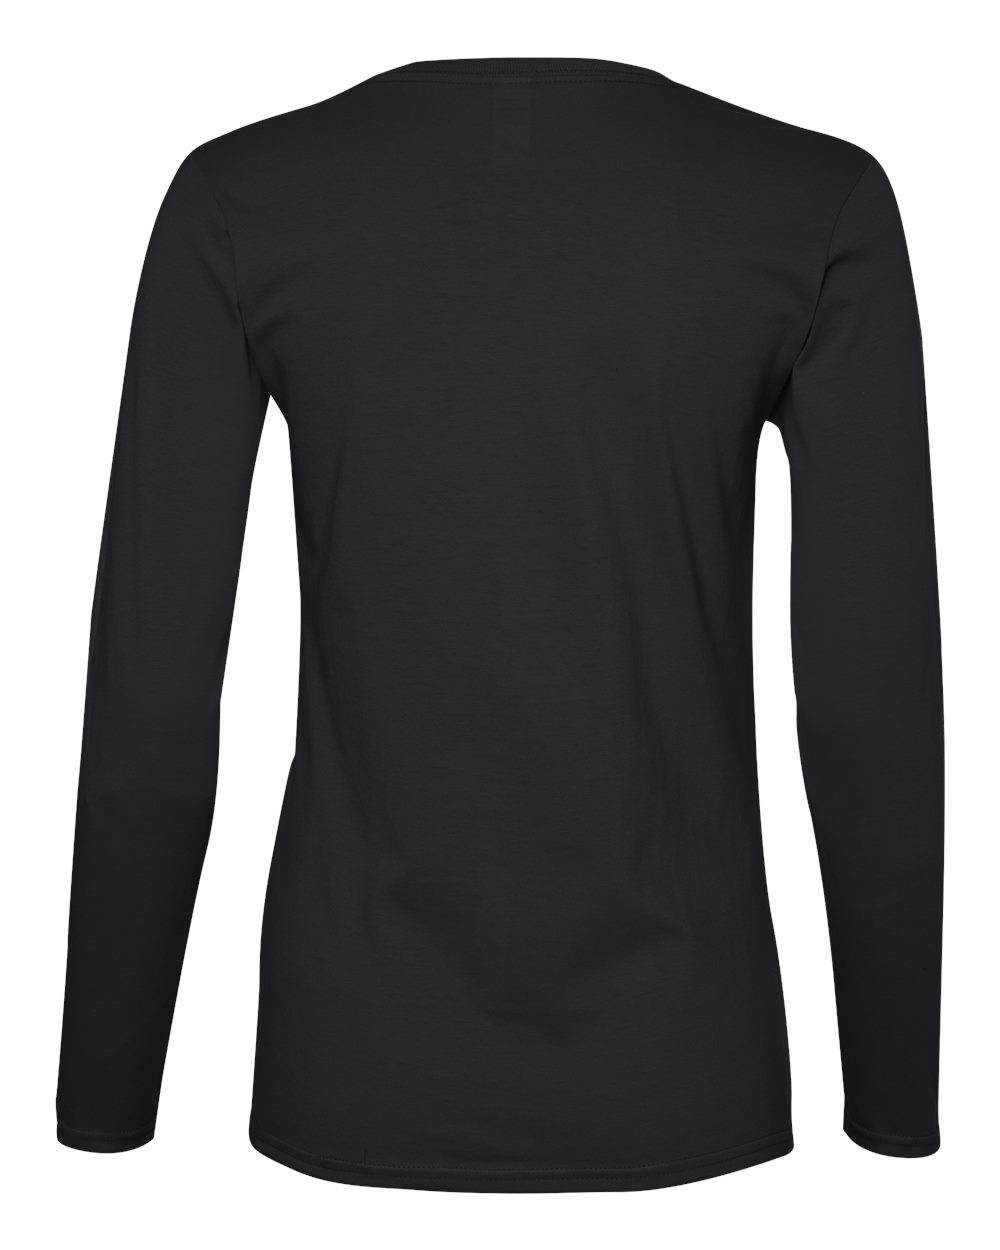 Anvil-Womens-Lightweight-Long-Sleeve-T-Shirt-884L-Size-S-2XL thumbnail 5